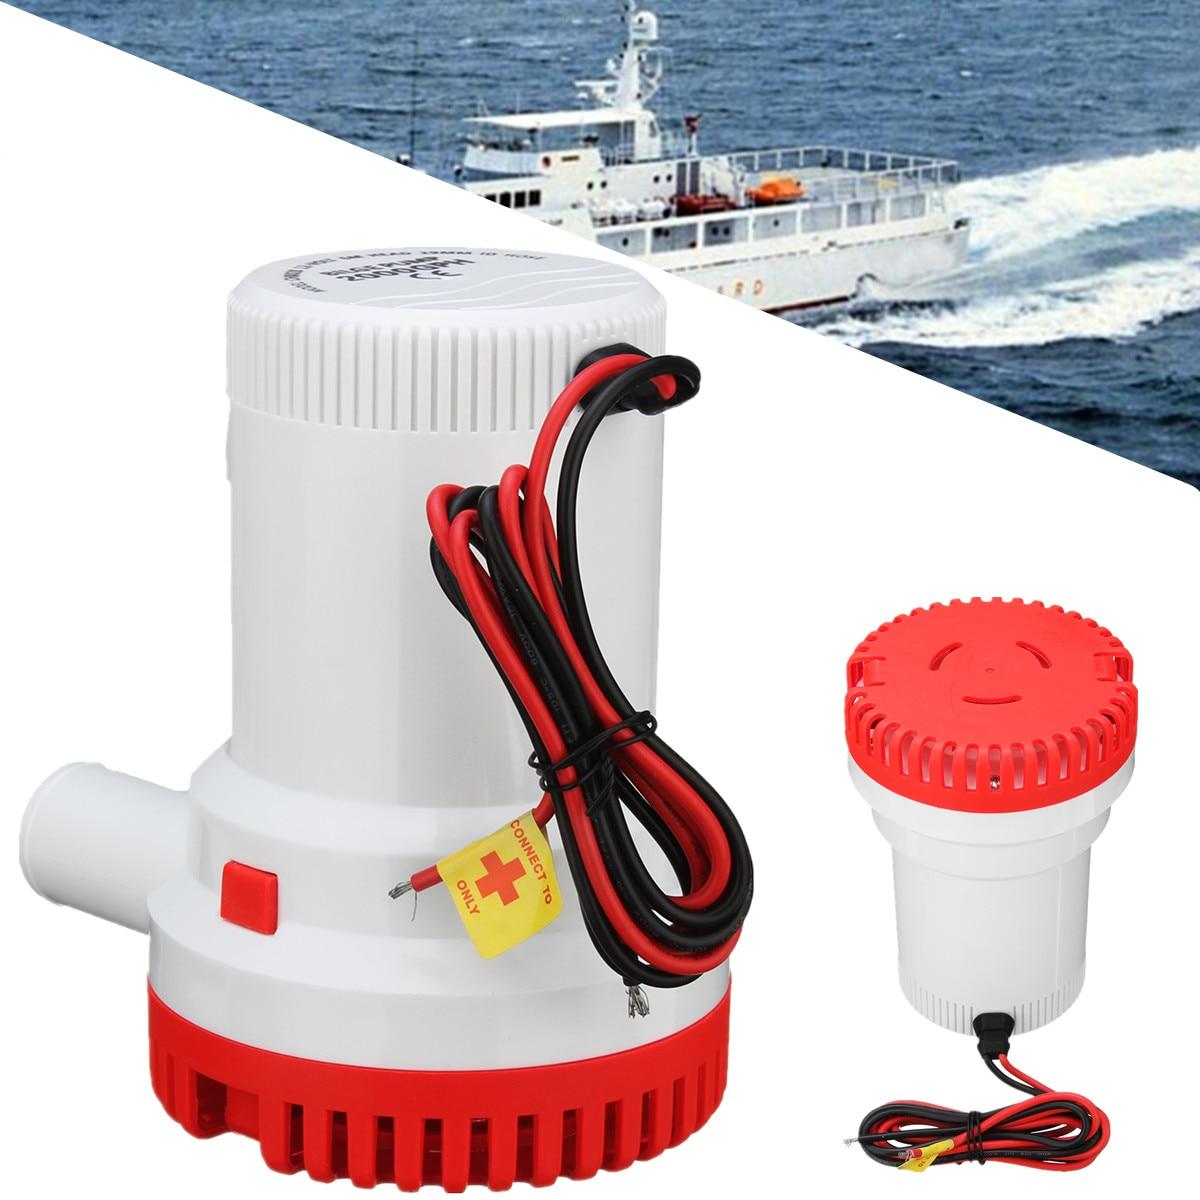 цена на 12V 8A 2000GPH Submersible Marine Boat Bilge Water Pump Fishing Caravan Camping Moisture Tight Seals Vibrationless Operation